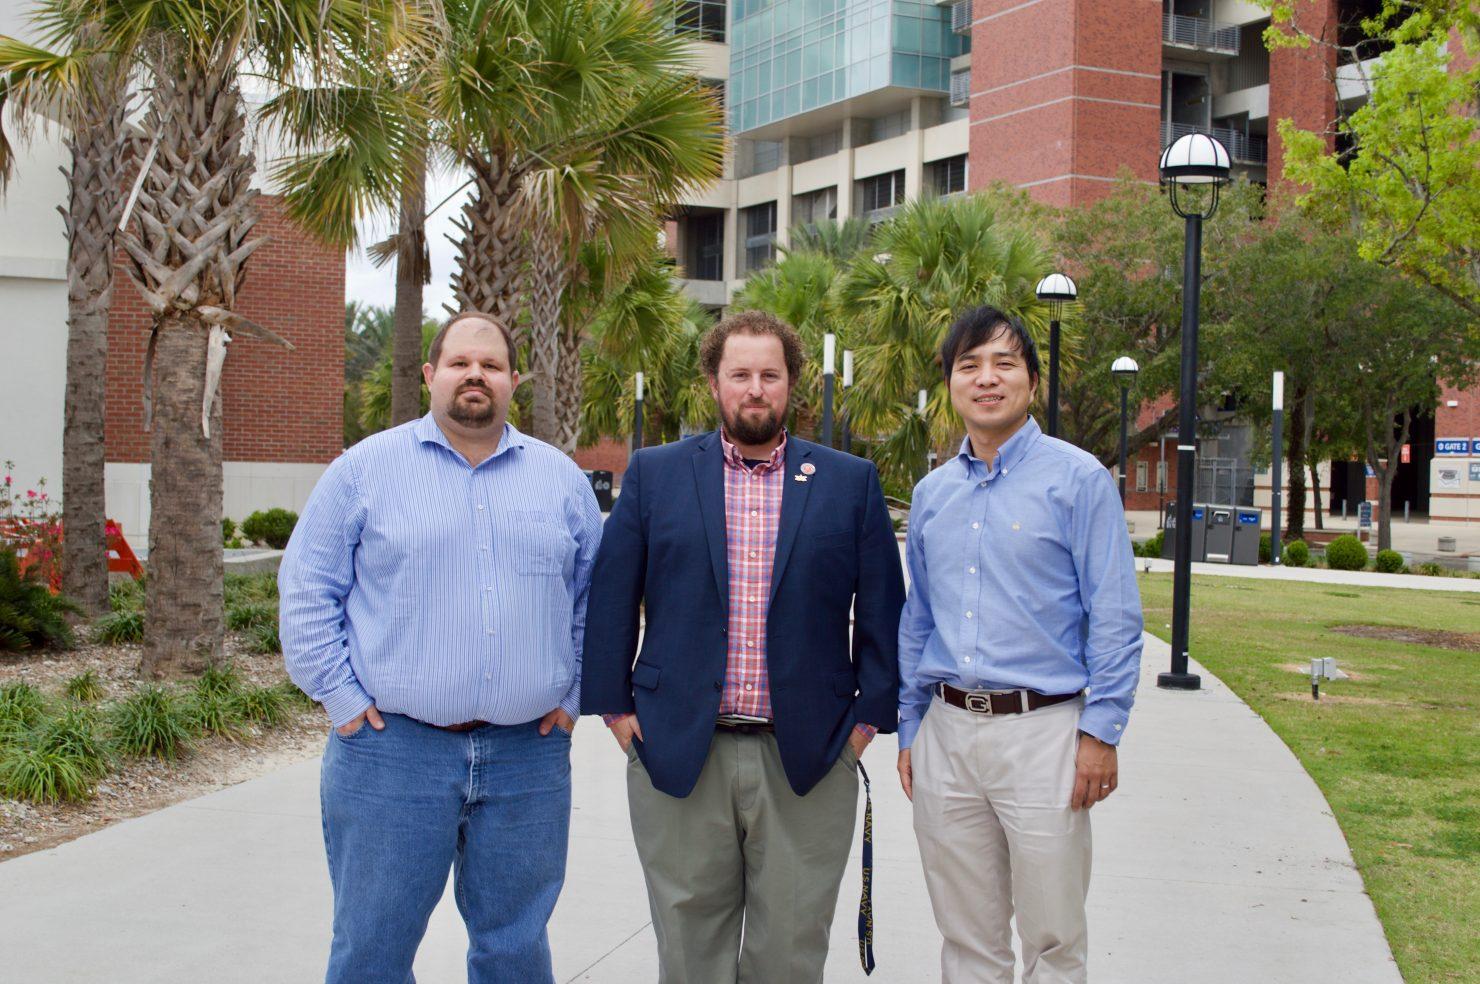 Ryan Houim, Kyle Hartig and Yier Jin